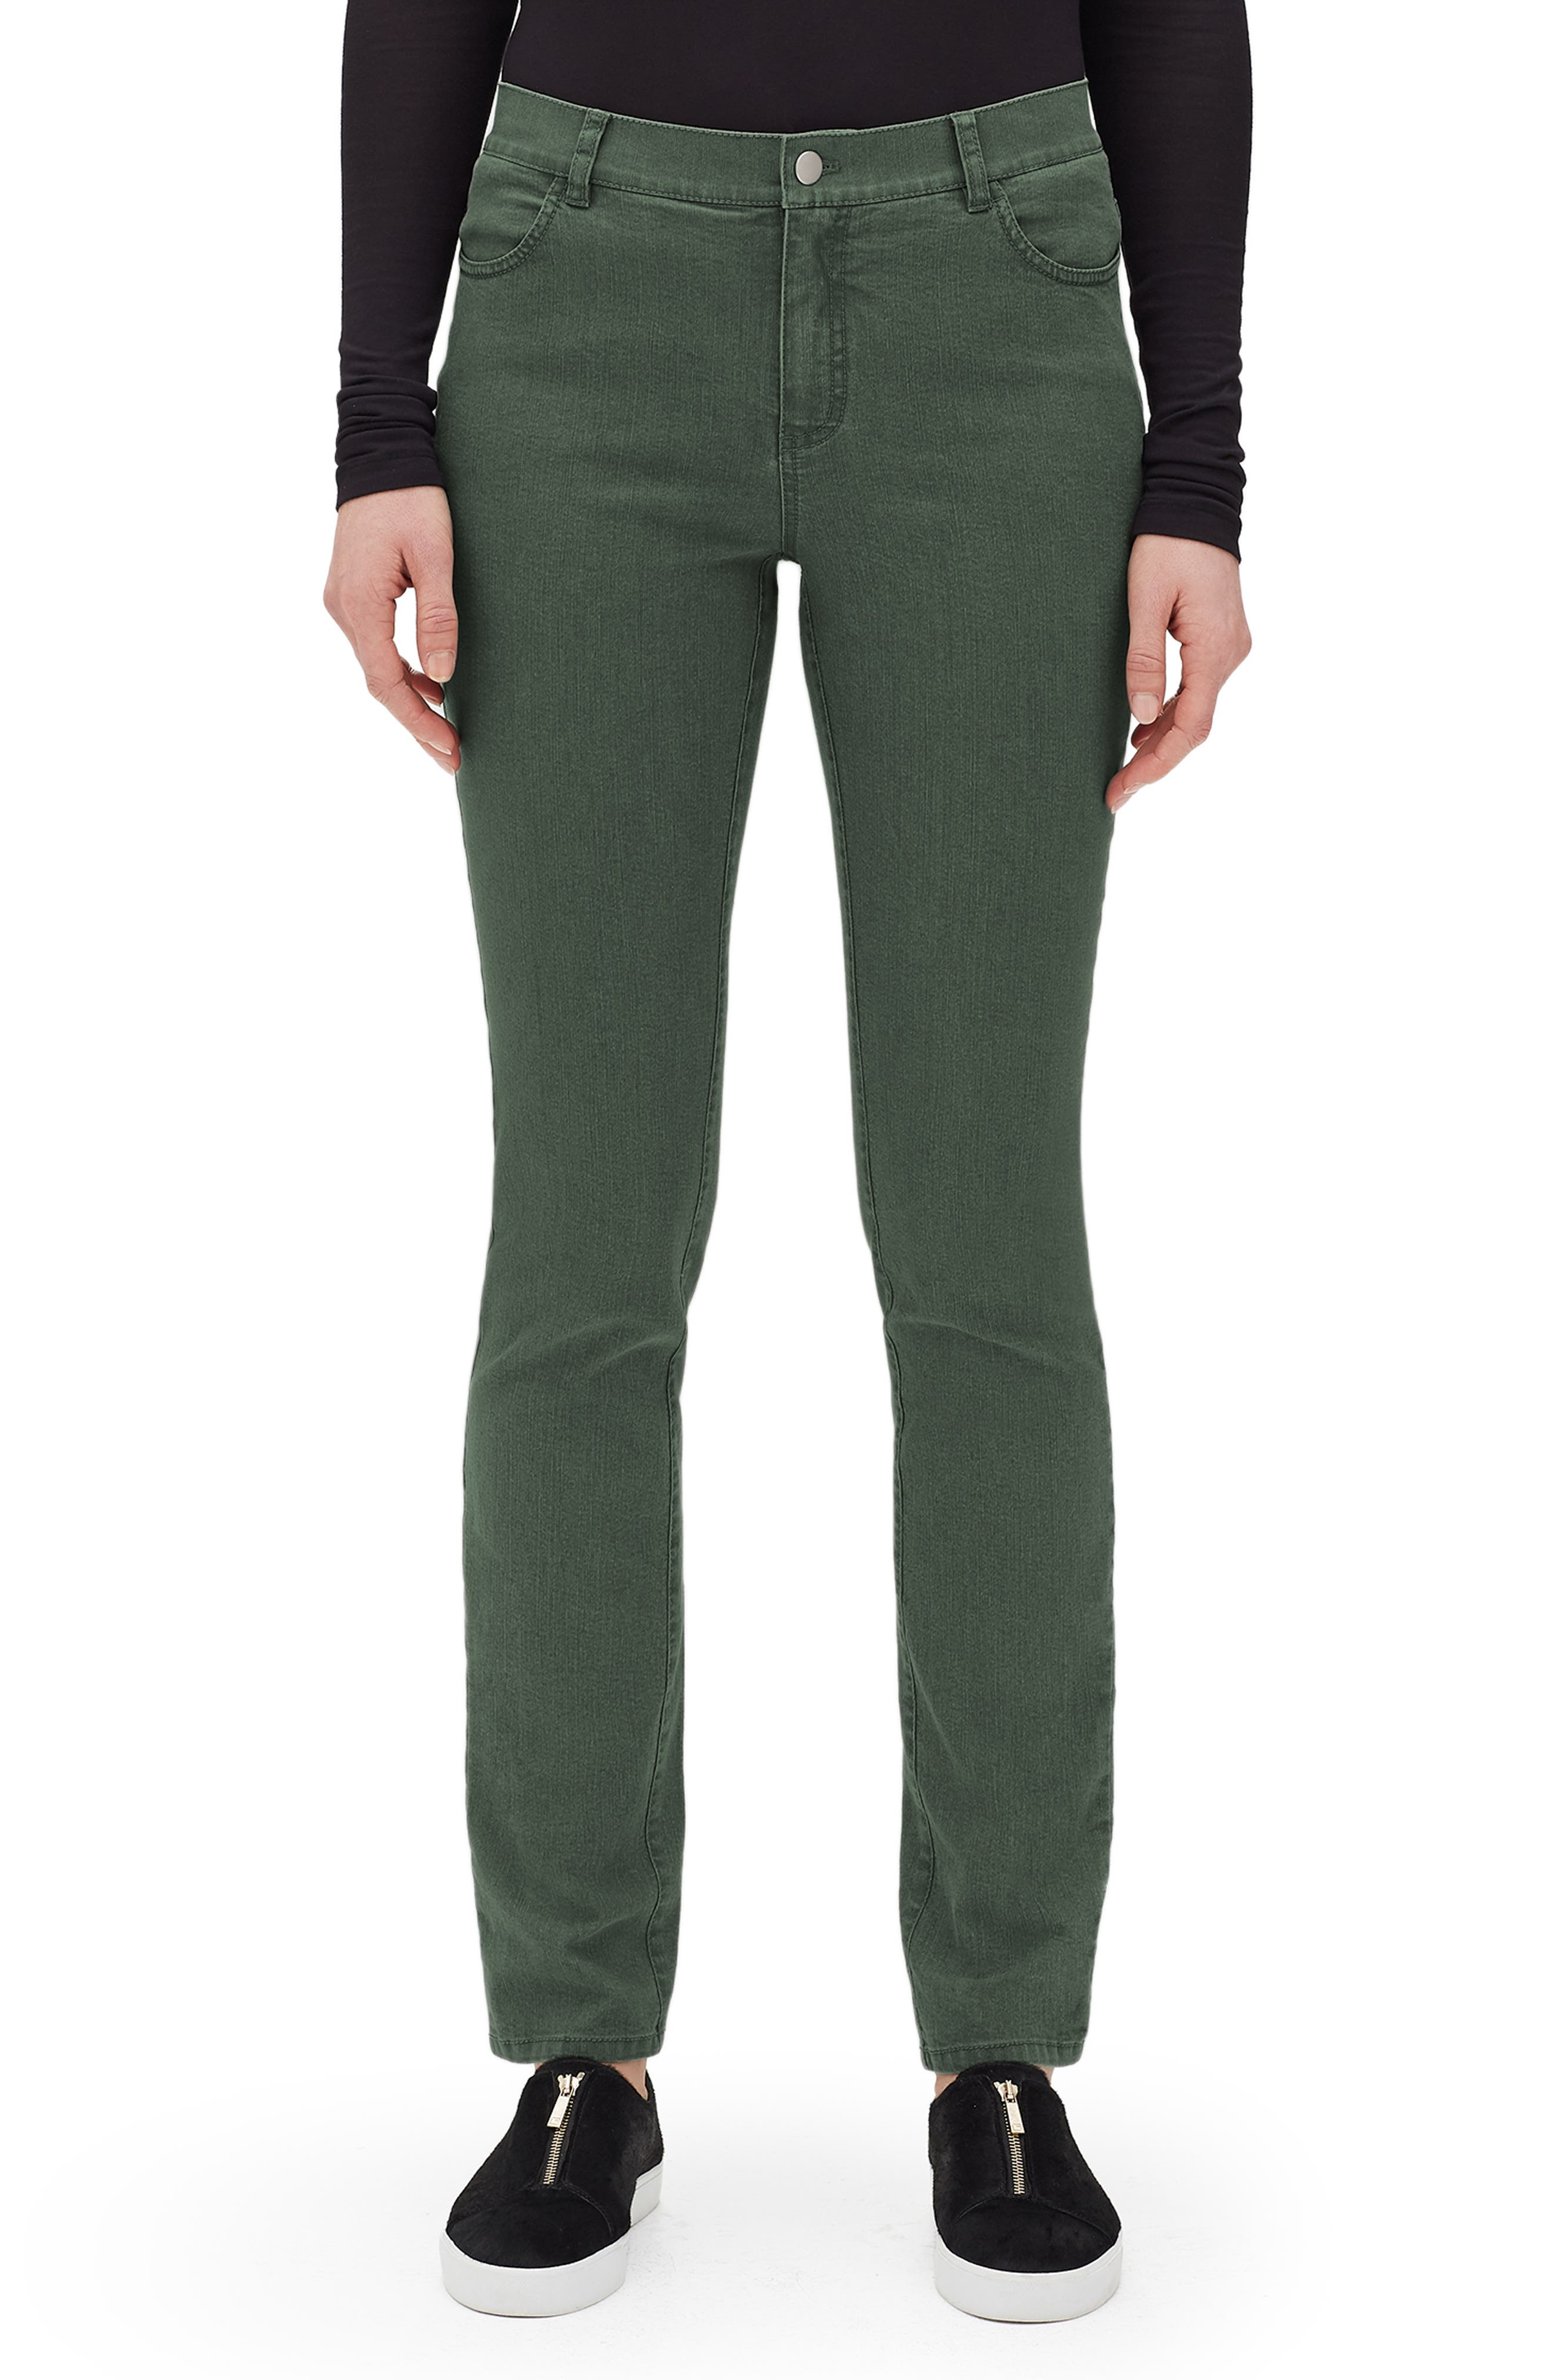 Thompson Bella Denim Slim-Leg Jean in Bottle Green